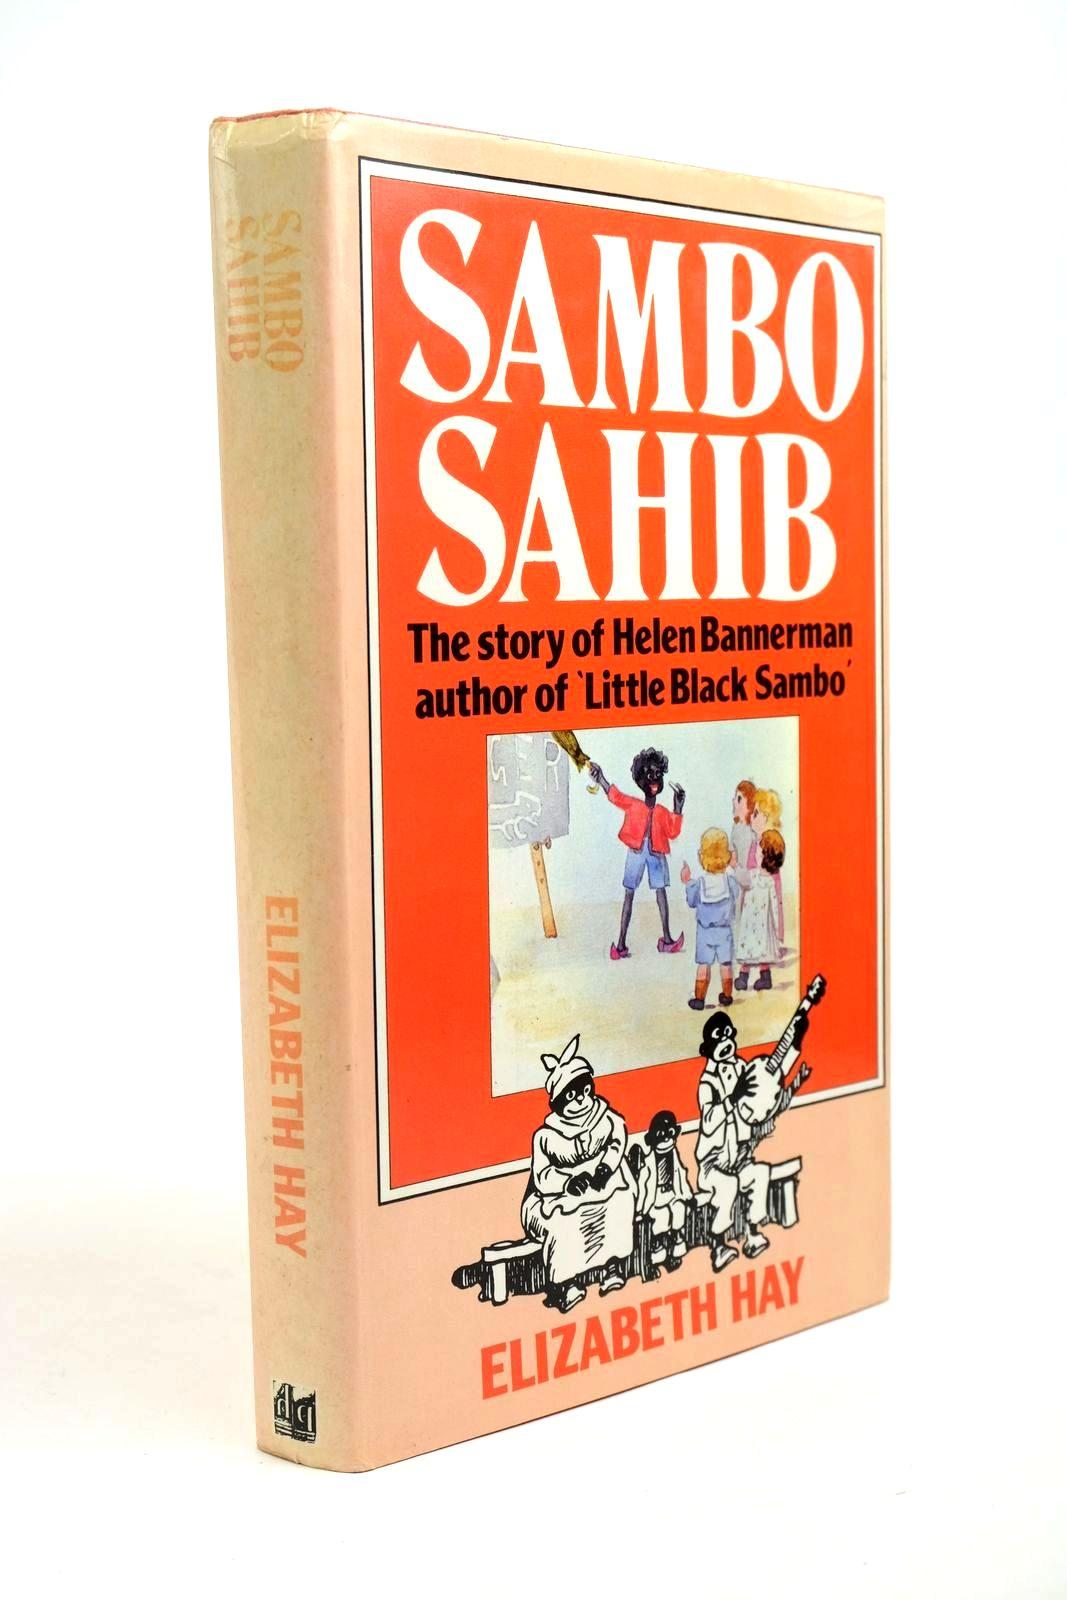 Photo of SAMBO SAHIB- Stock Number: 1321445